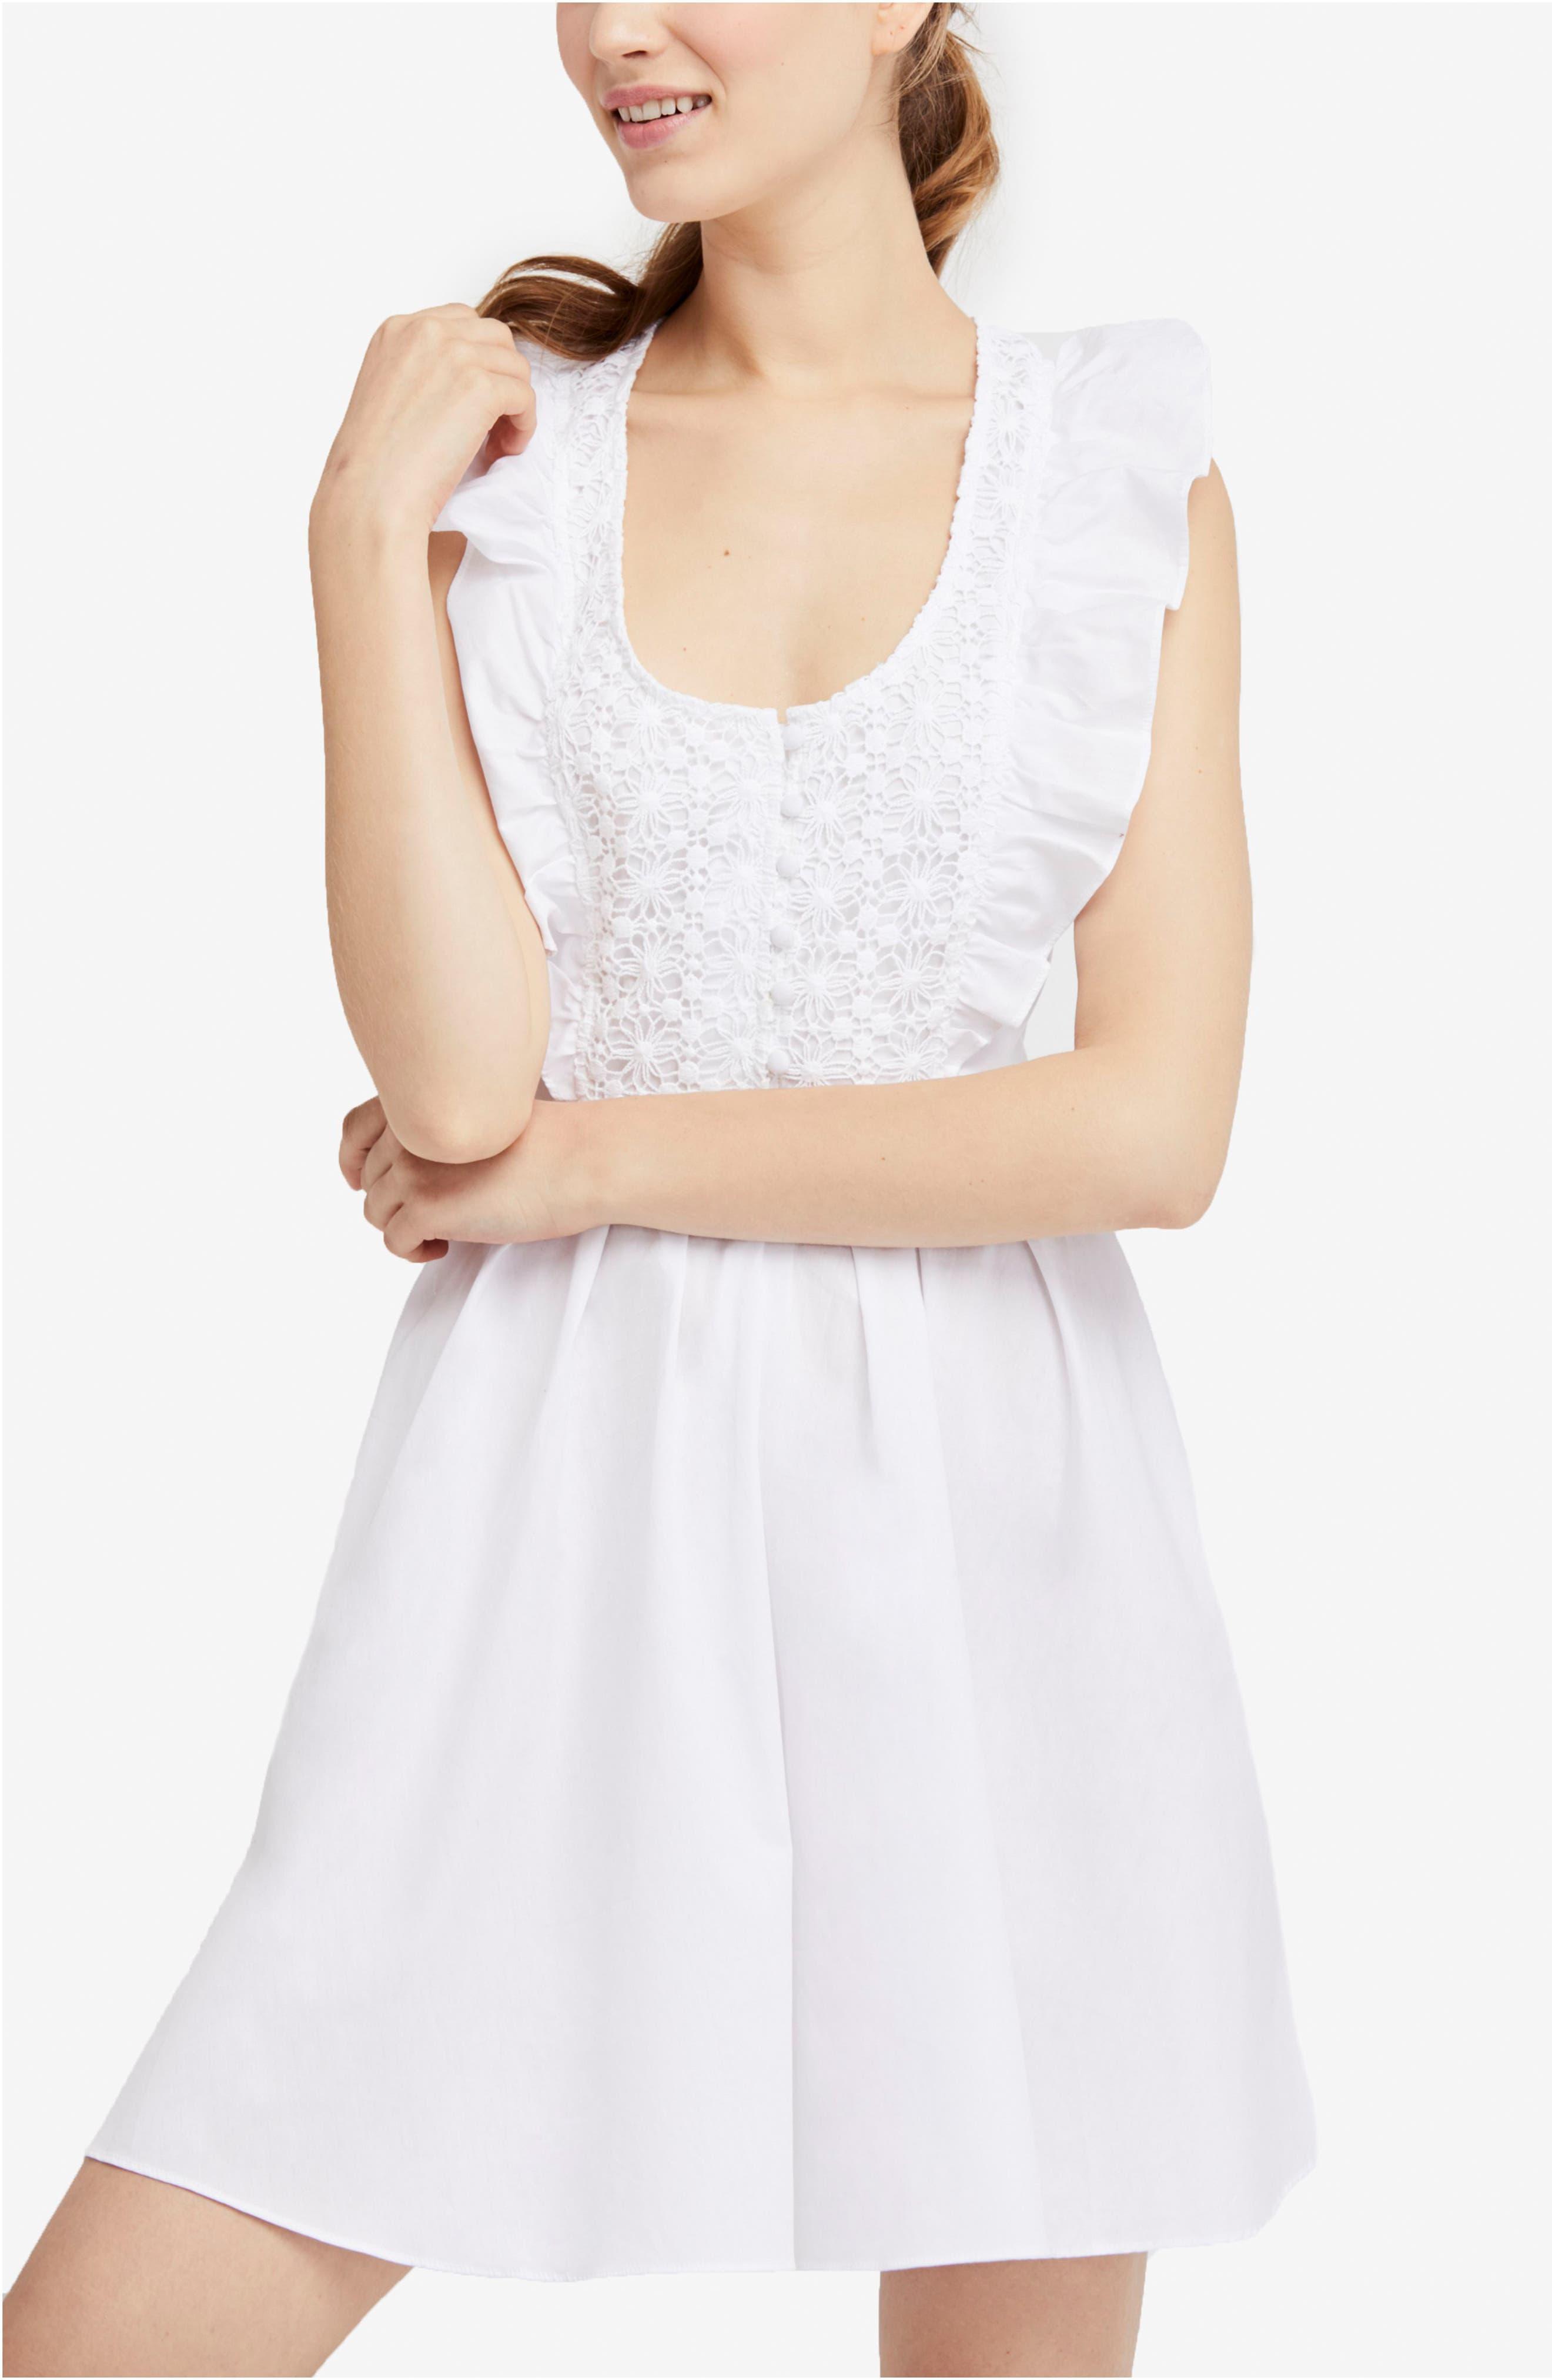 Half Moon Minidress,                         Main,                         color, White